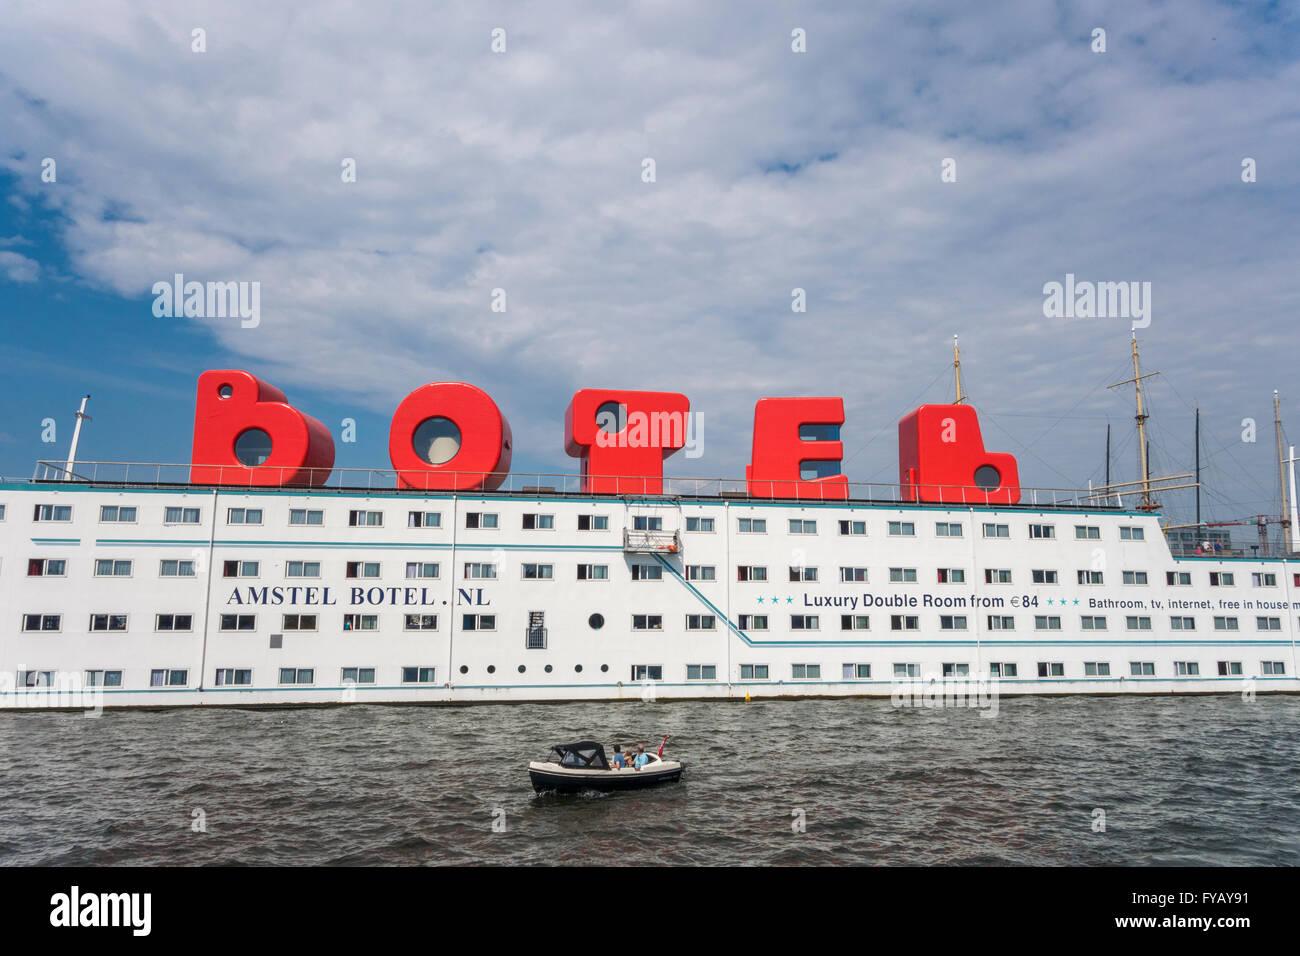 Floating Boat Hotel Amsterdam